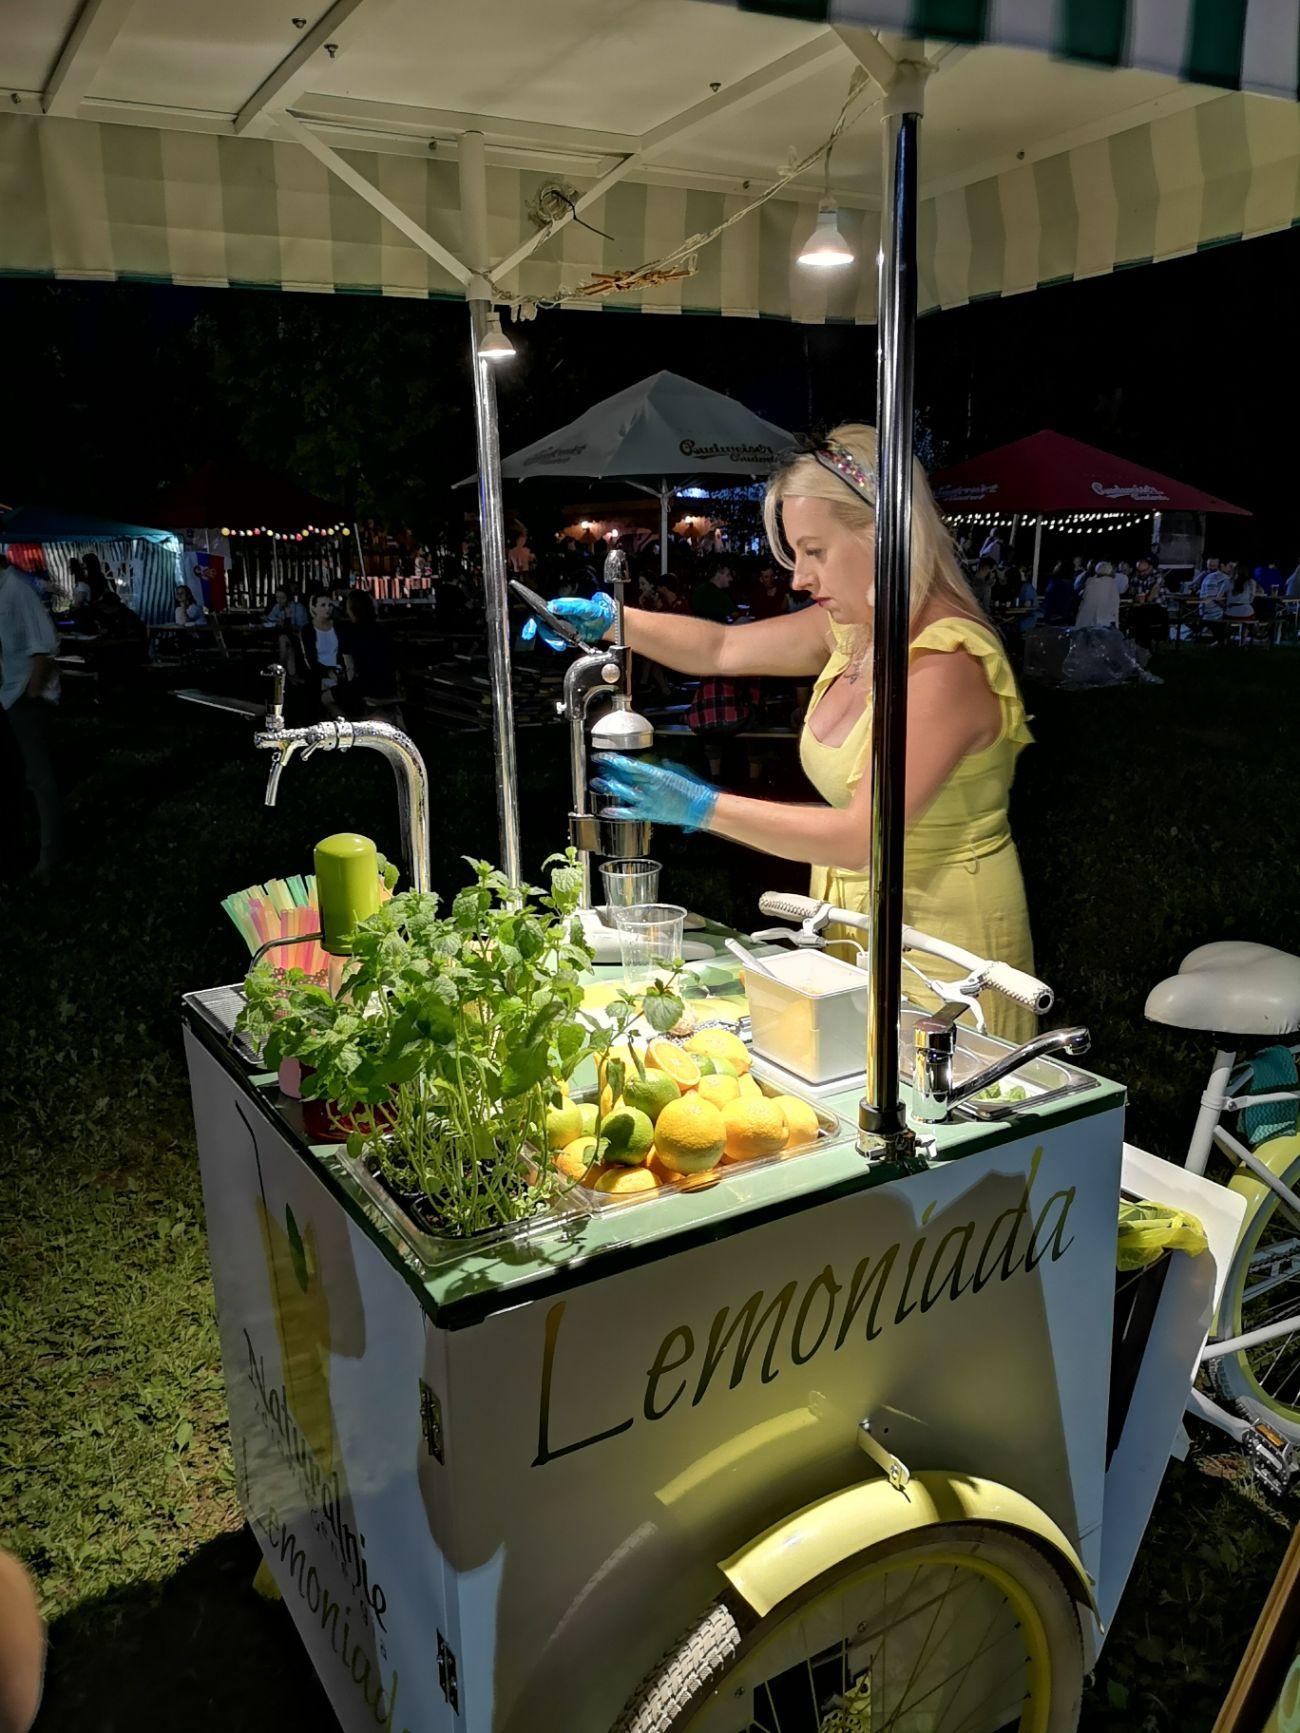 pannonica festival jedzenie gastronomia